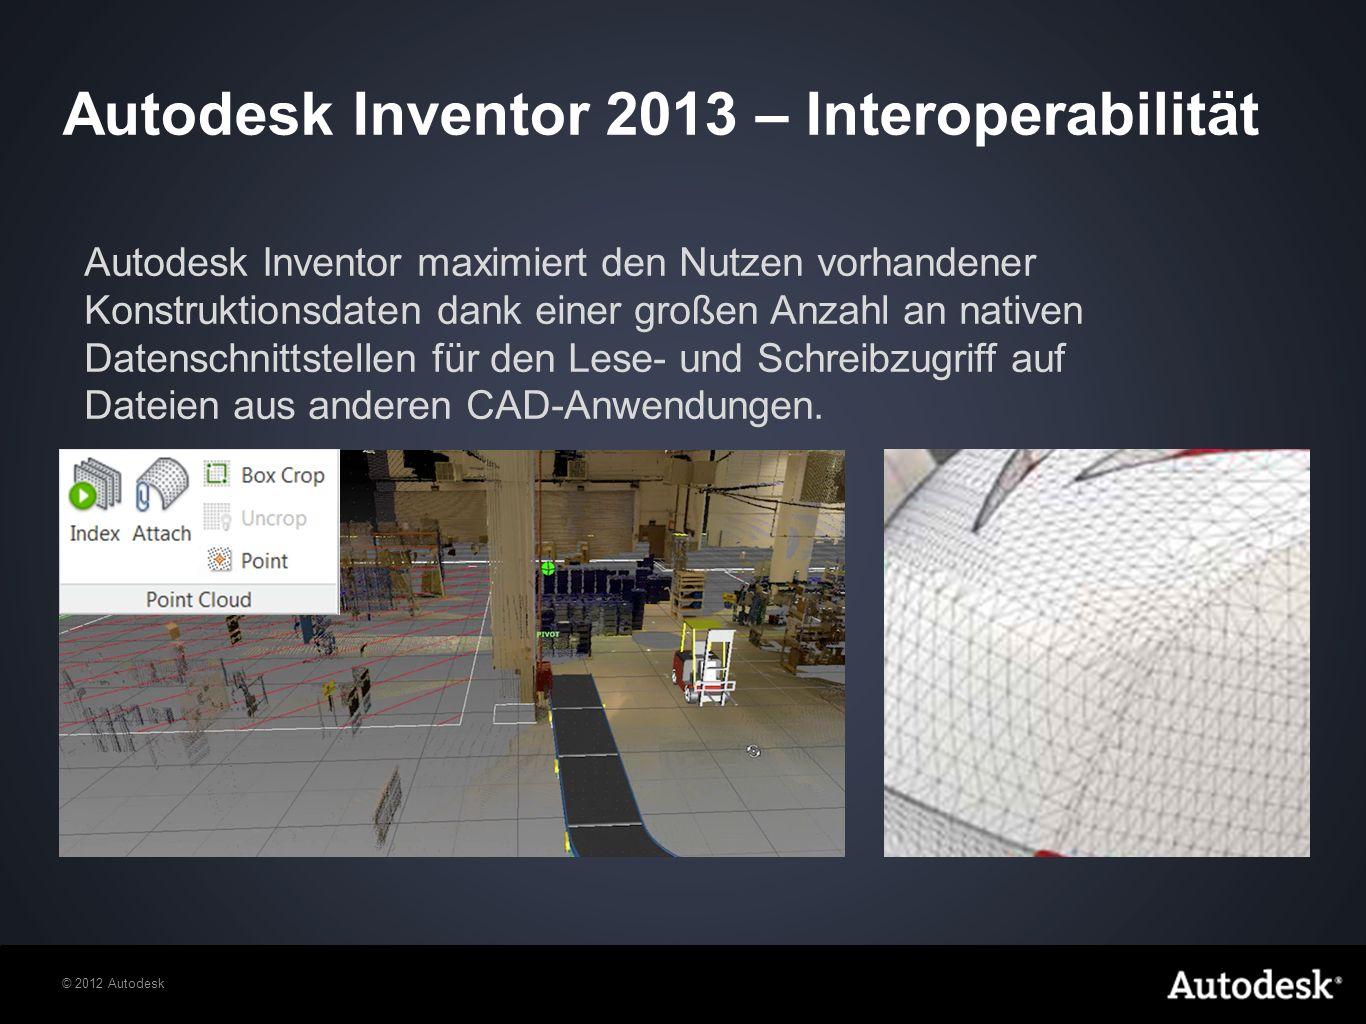 Autodesk Inventor 2013 – Interoperabilität